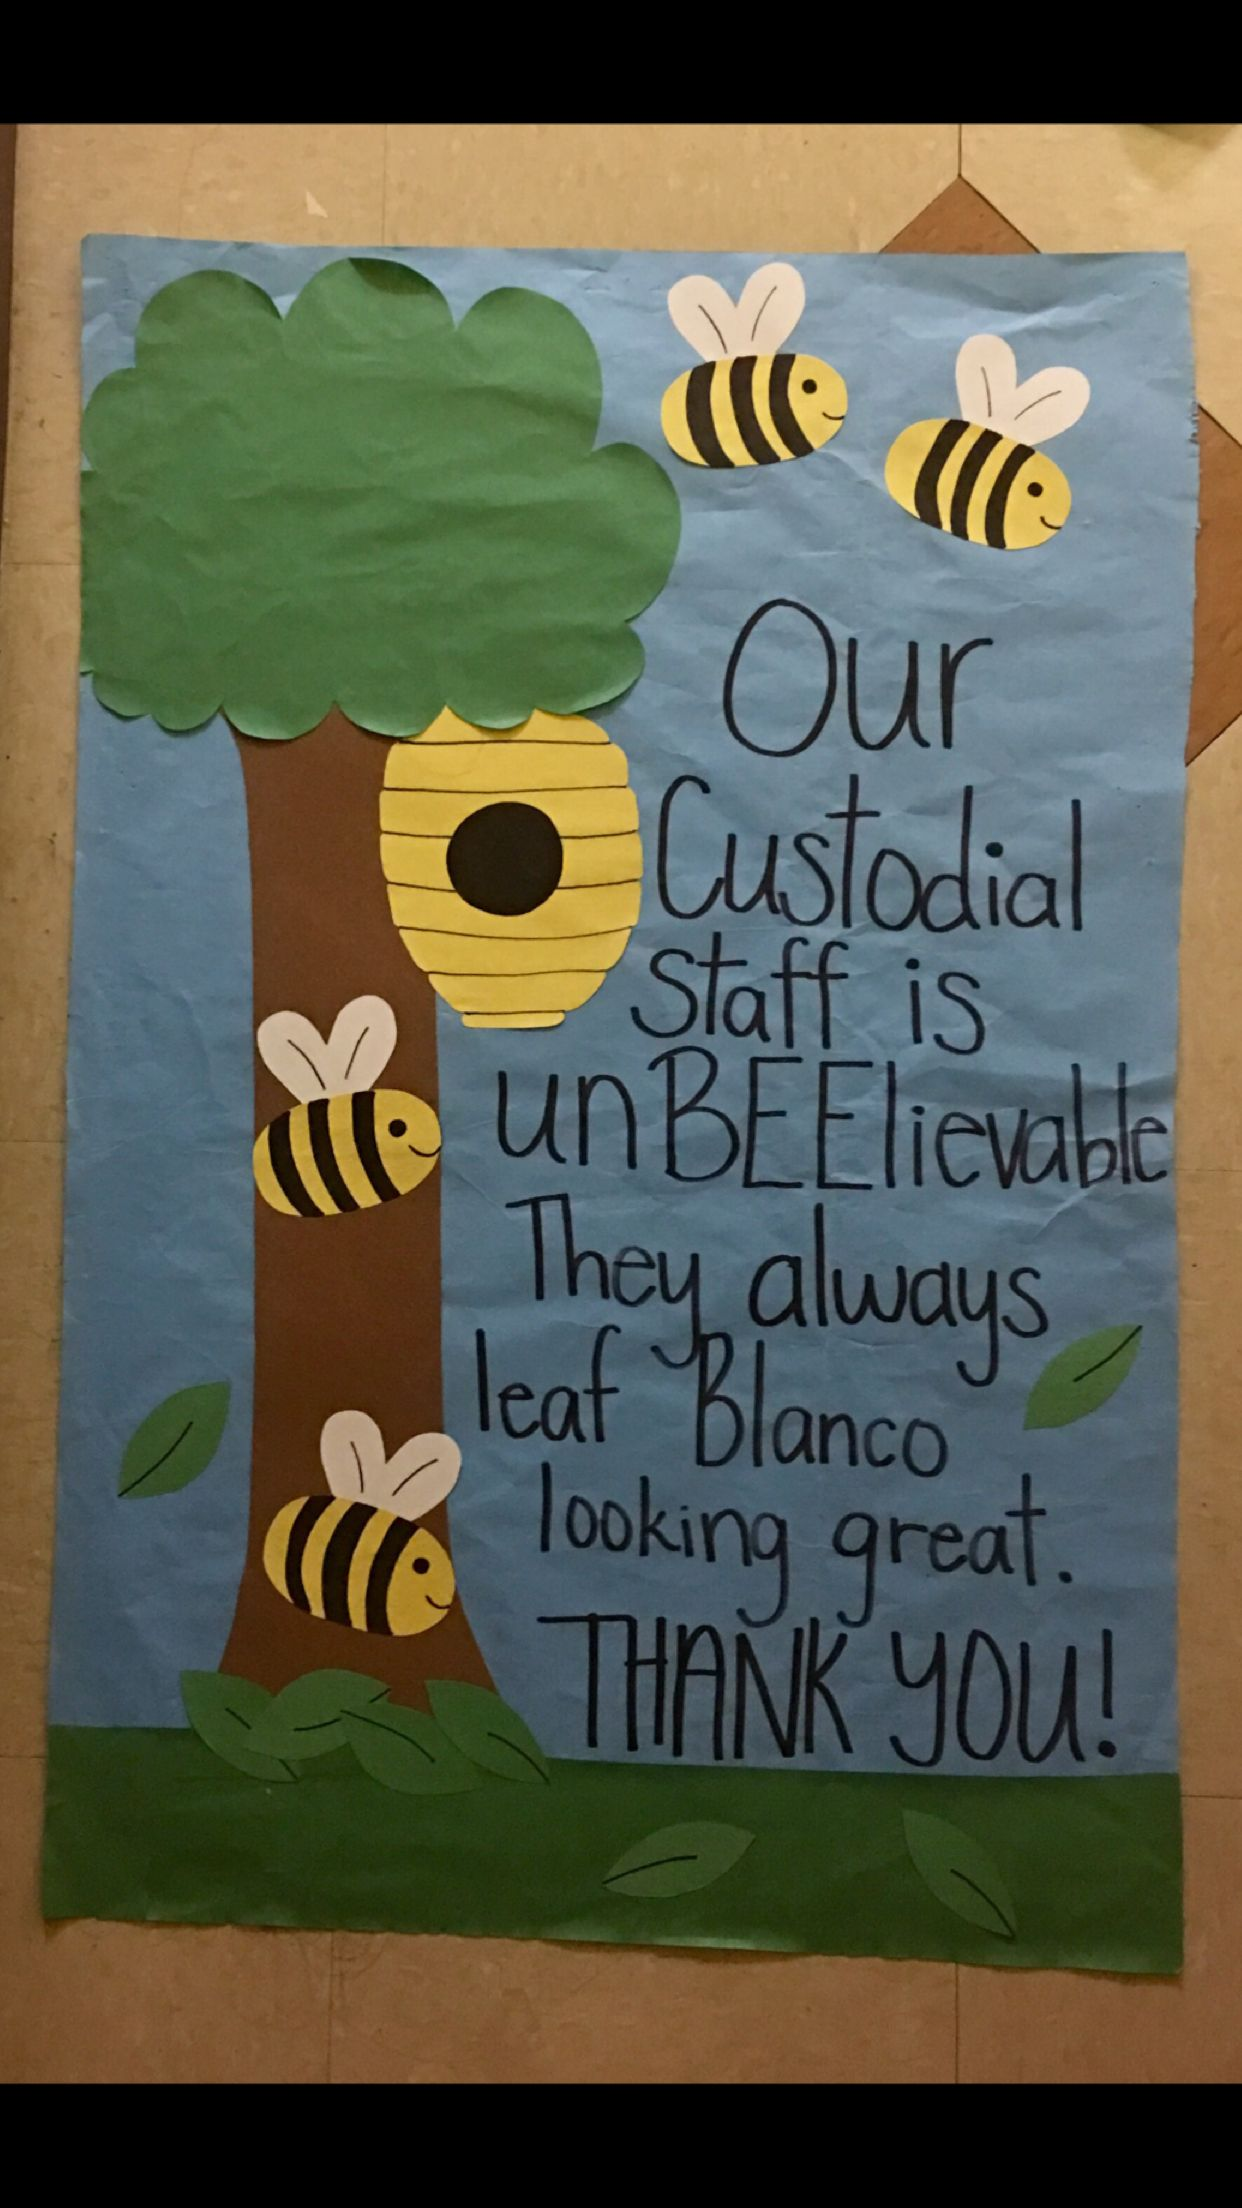 Custodial Appreciation #ra #ralife #passive #bulletinboard #custodialappreciation #bees #custodianappreciationgifts